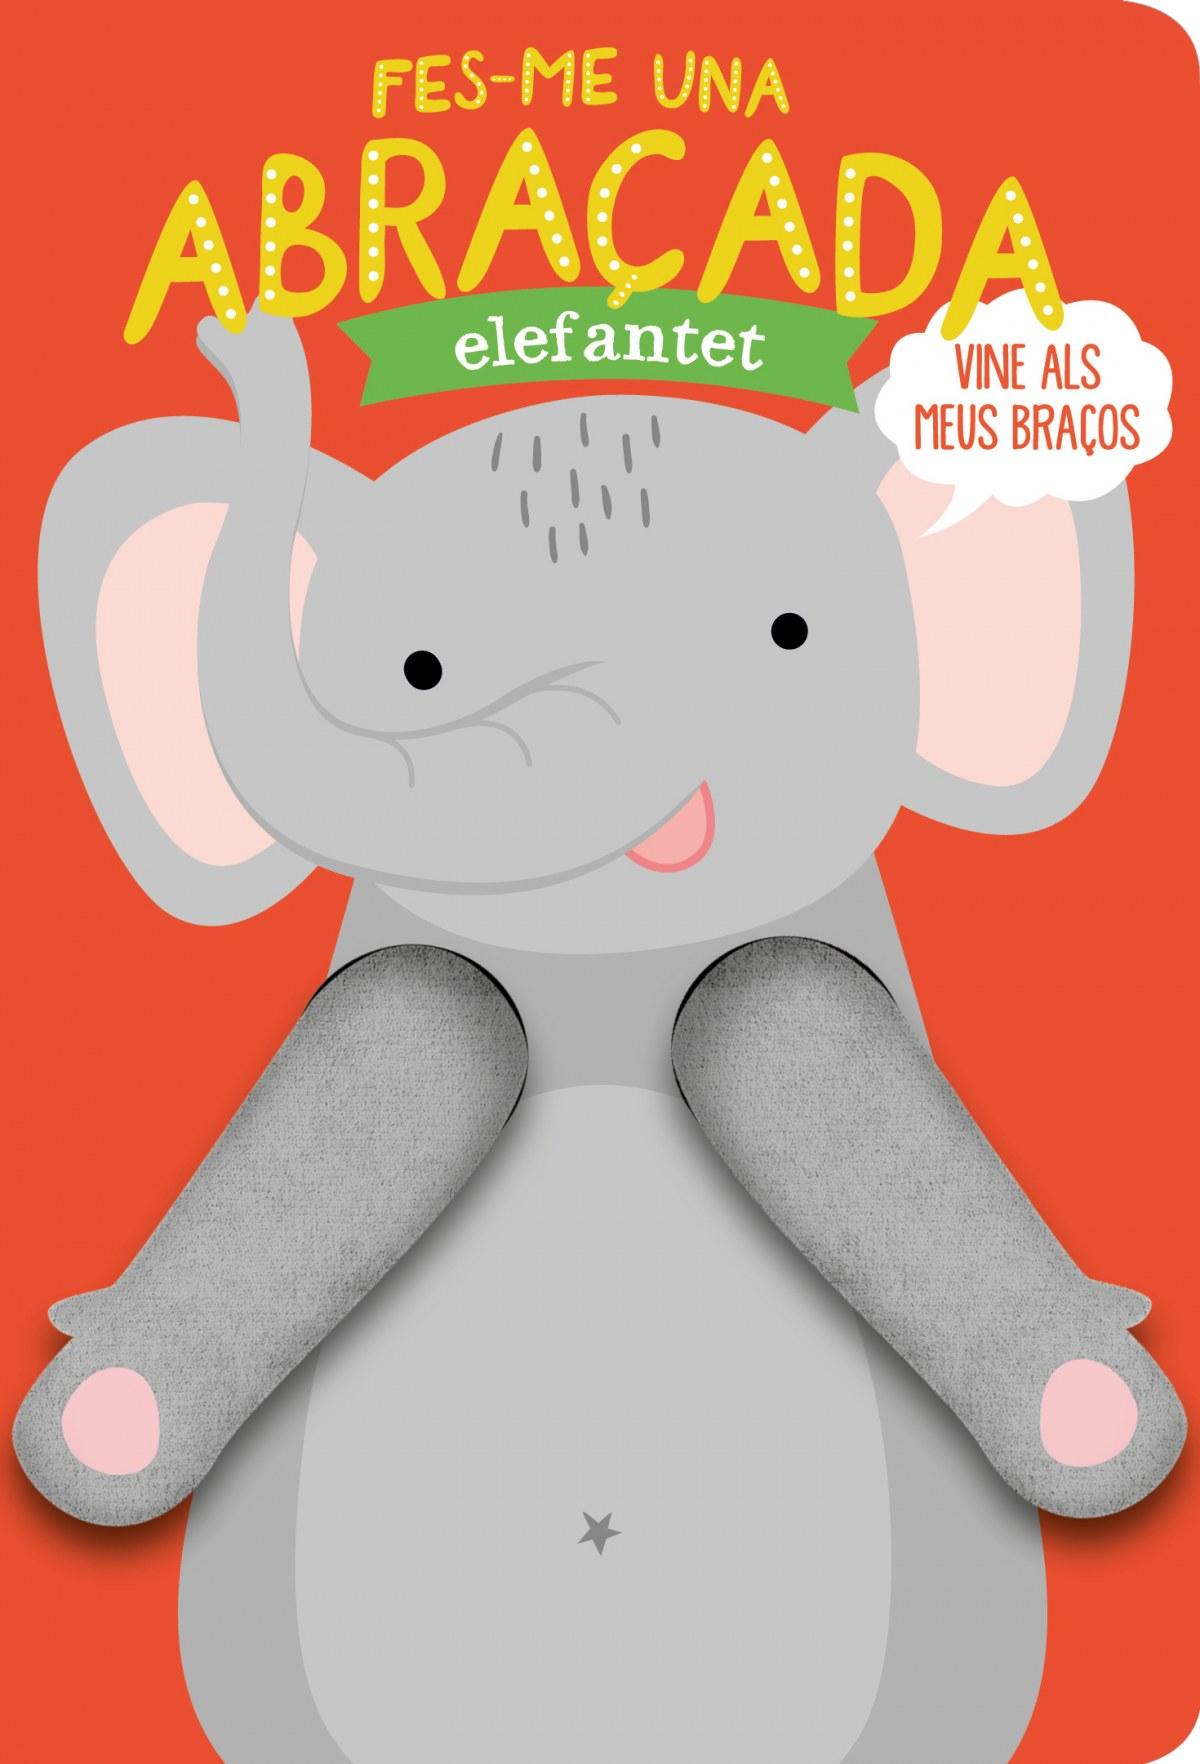 Fes-me una abraçada elefantet